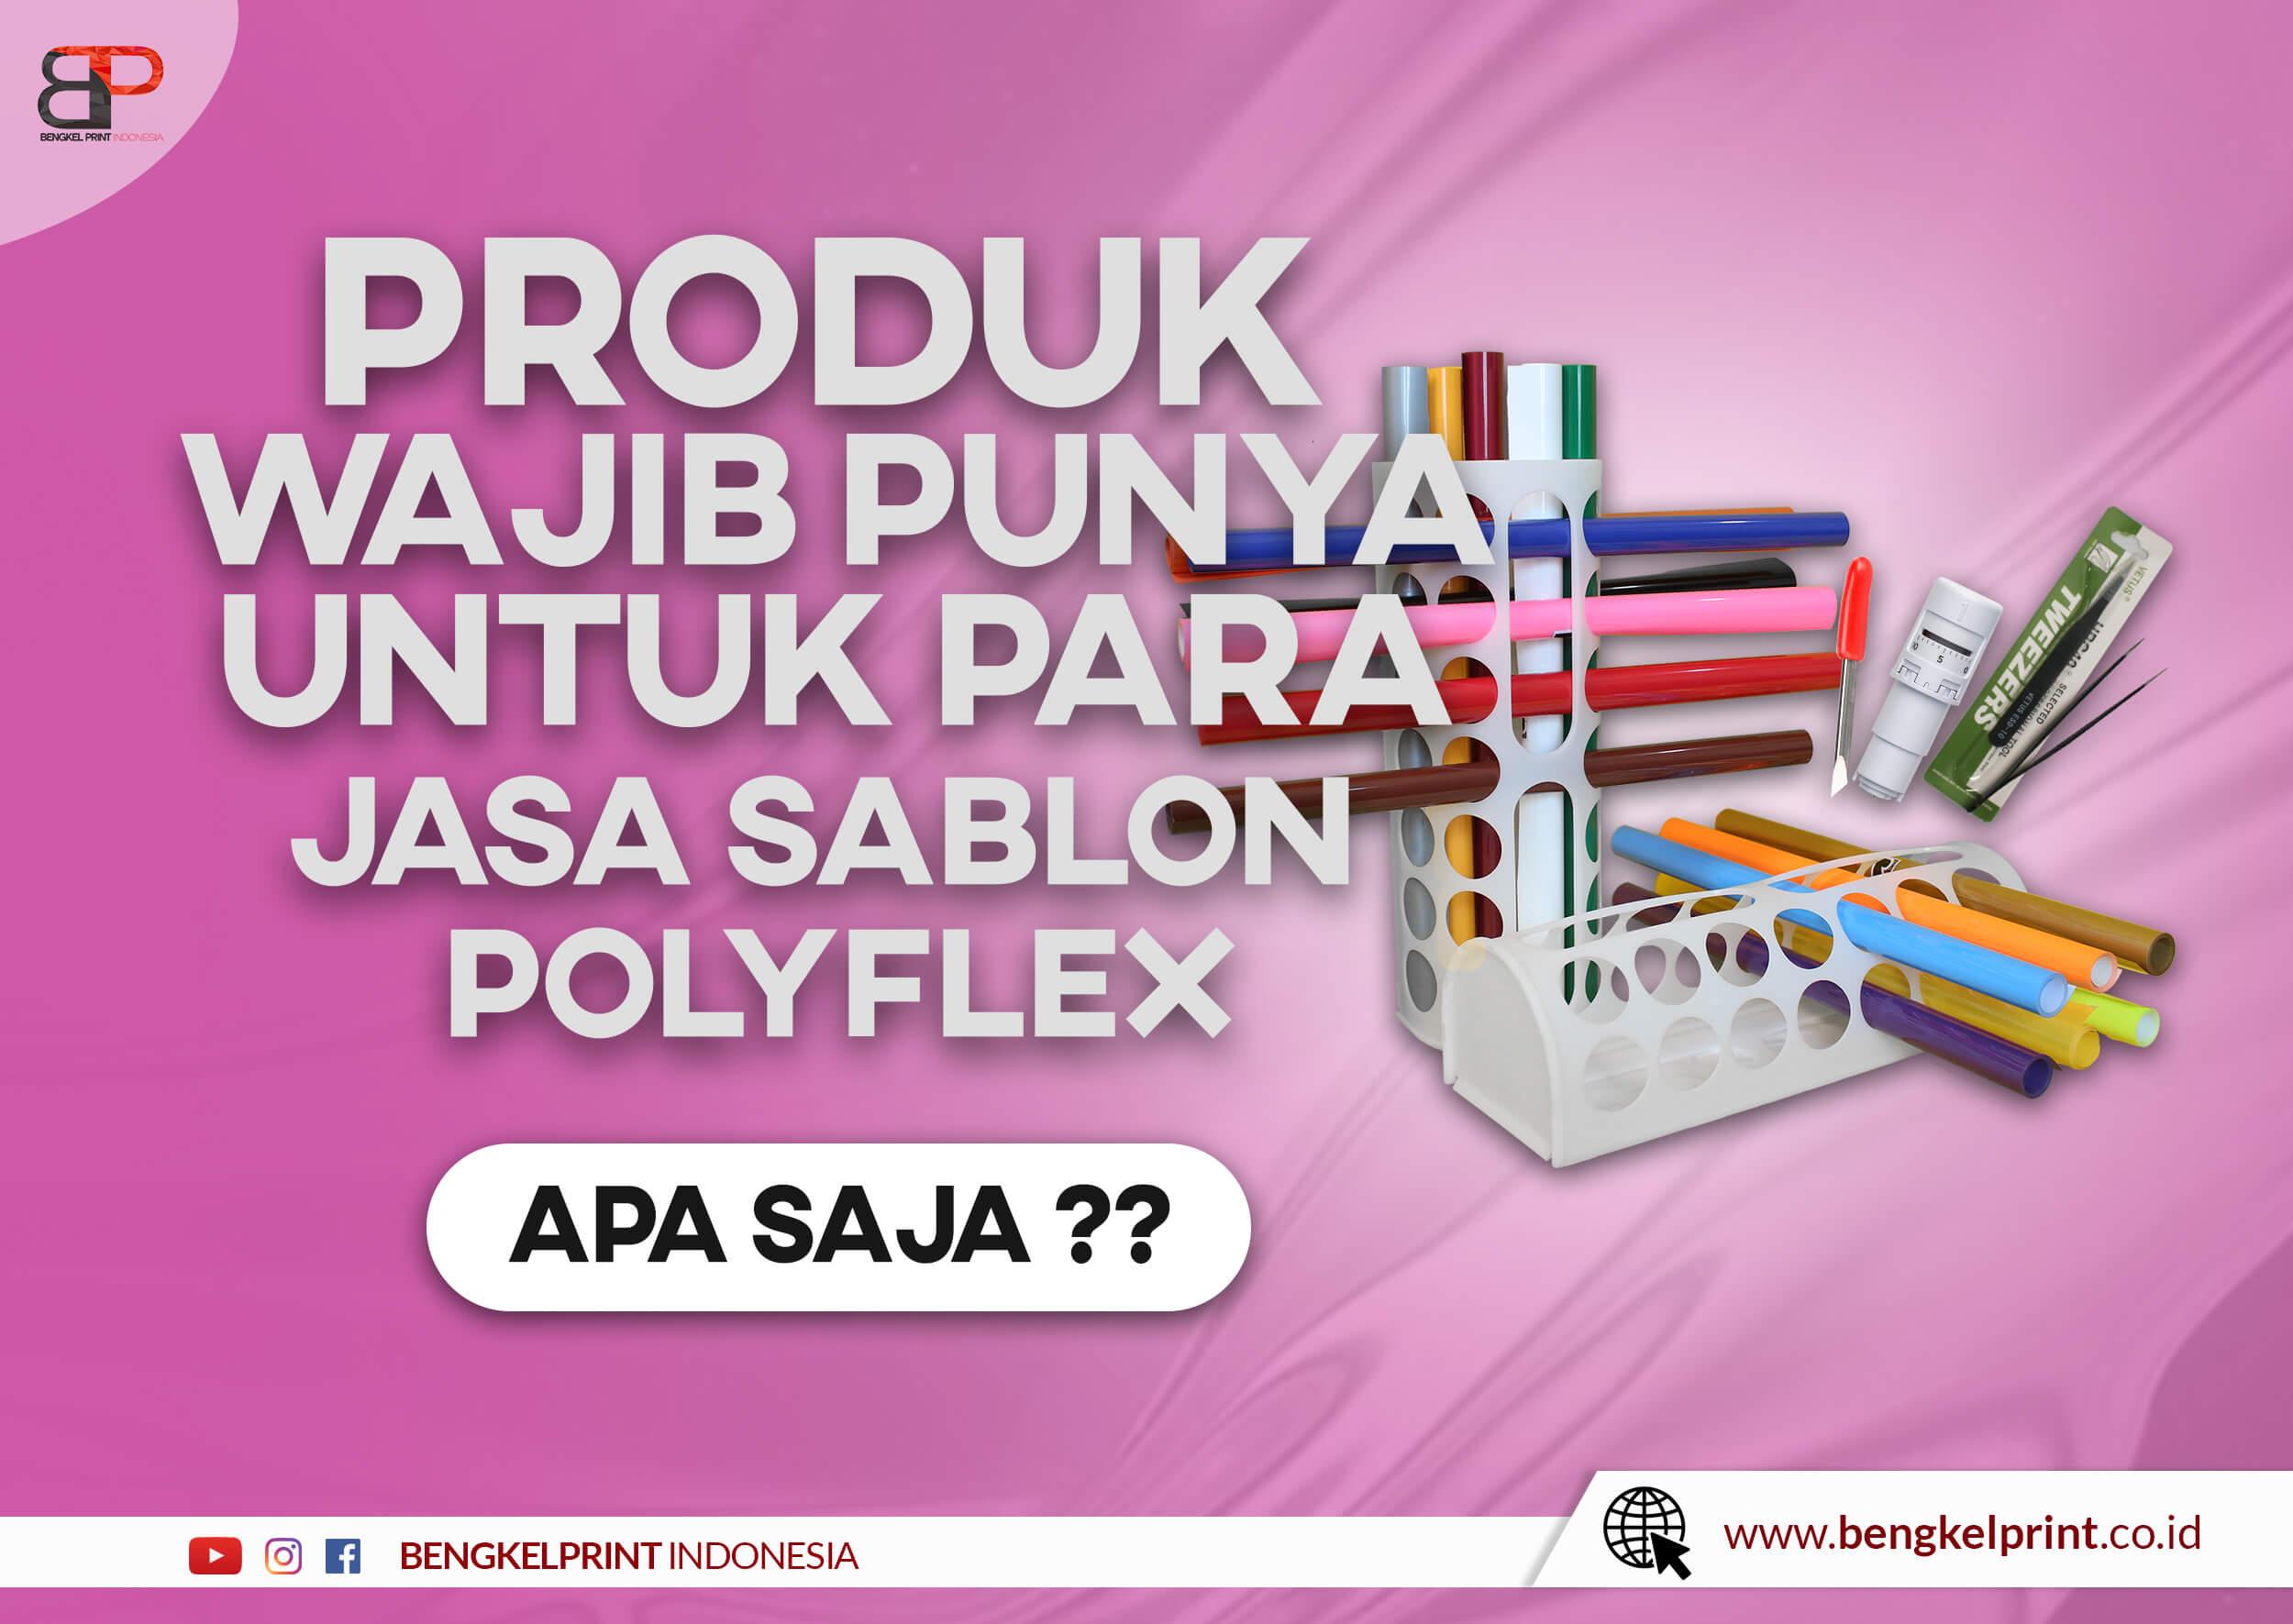 Daftar consumable sablon polyflex dan harga 2021